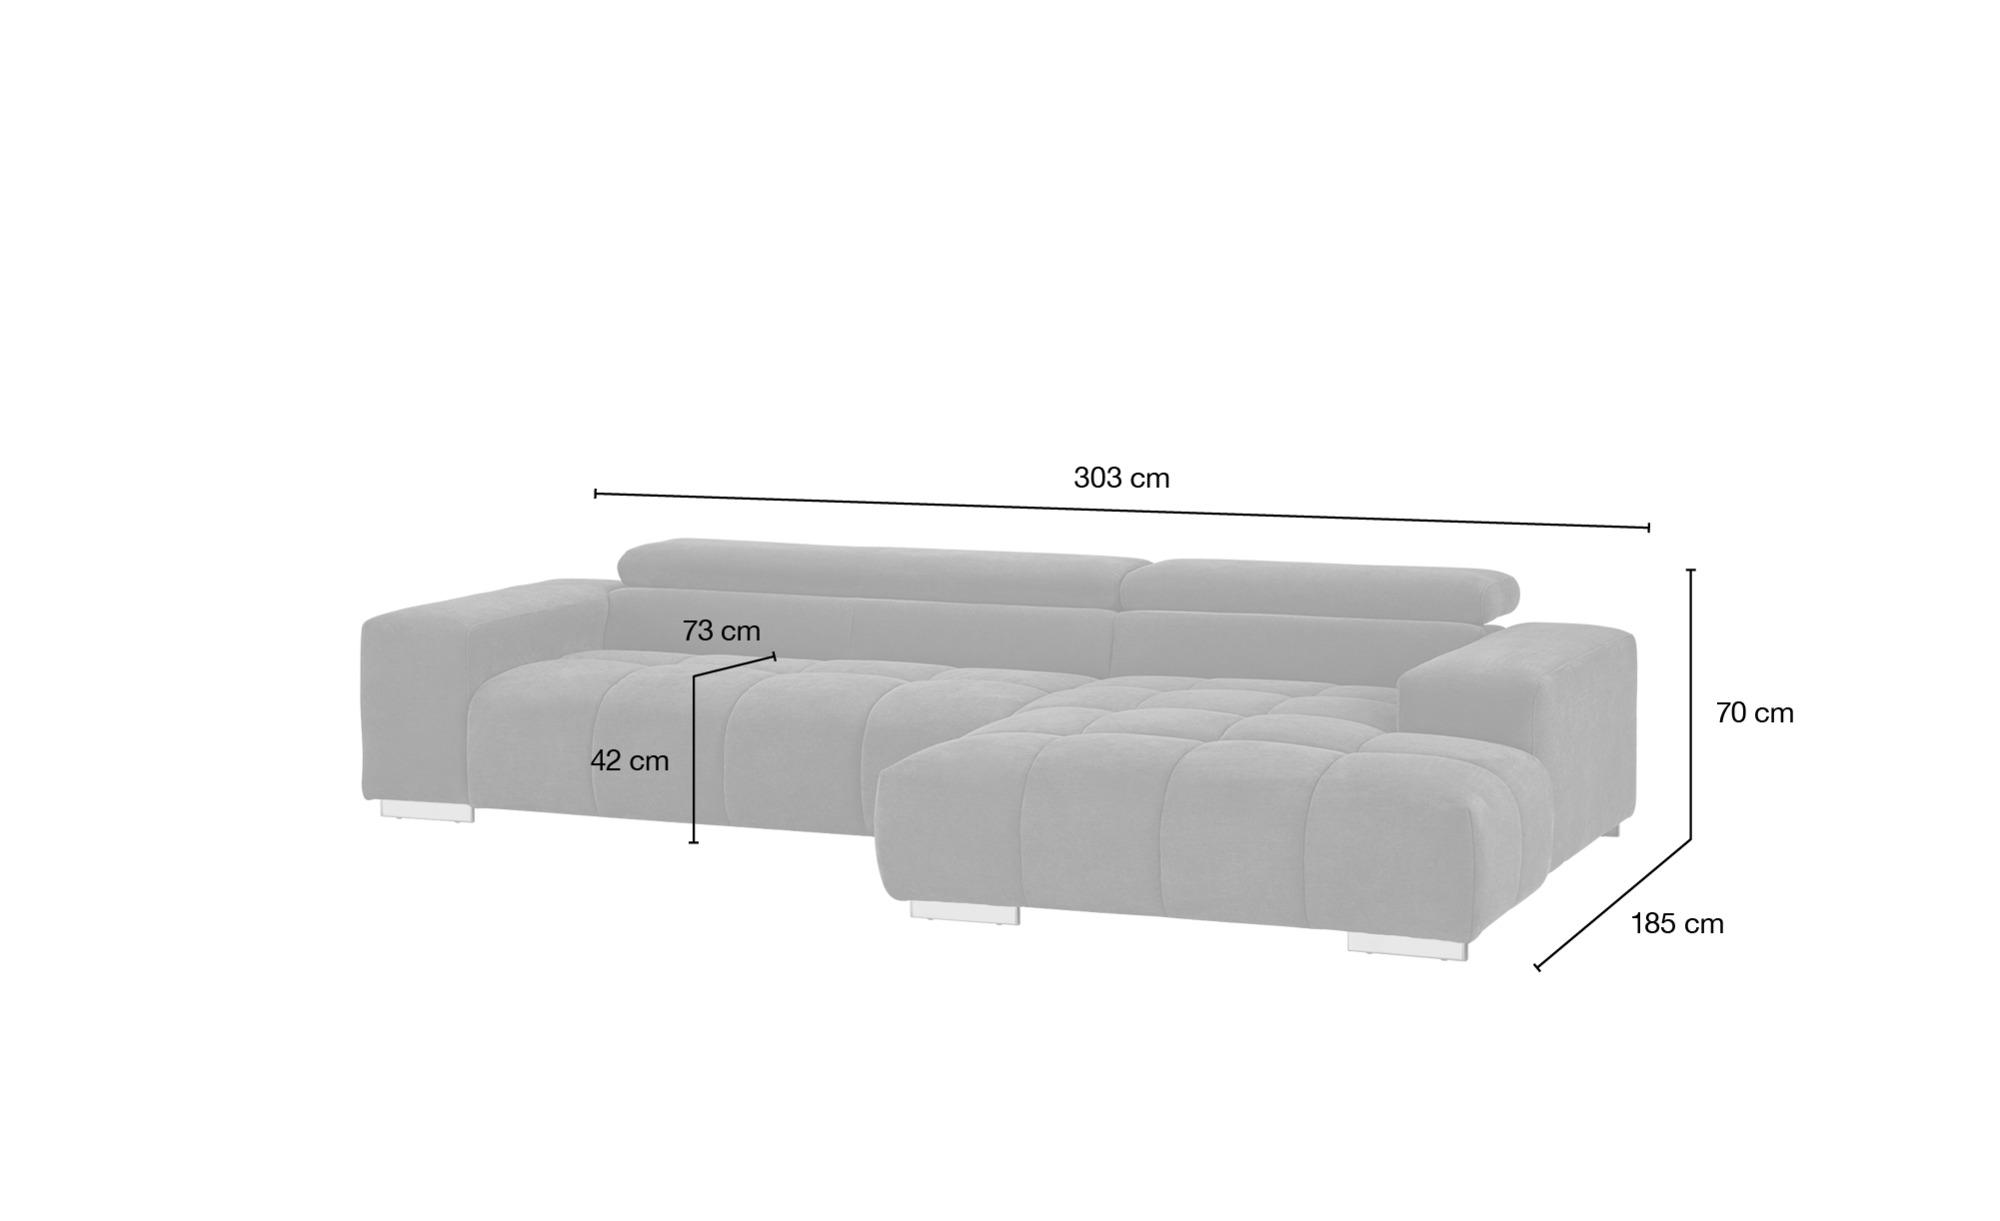 uno Ecksofa grün - Mikrofaser Origo ¦ grün ¦ Maße (cm): H: 70 Polstermöbel > Sofas > Ecksofas - Höffner